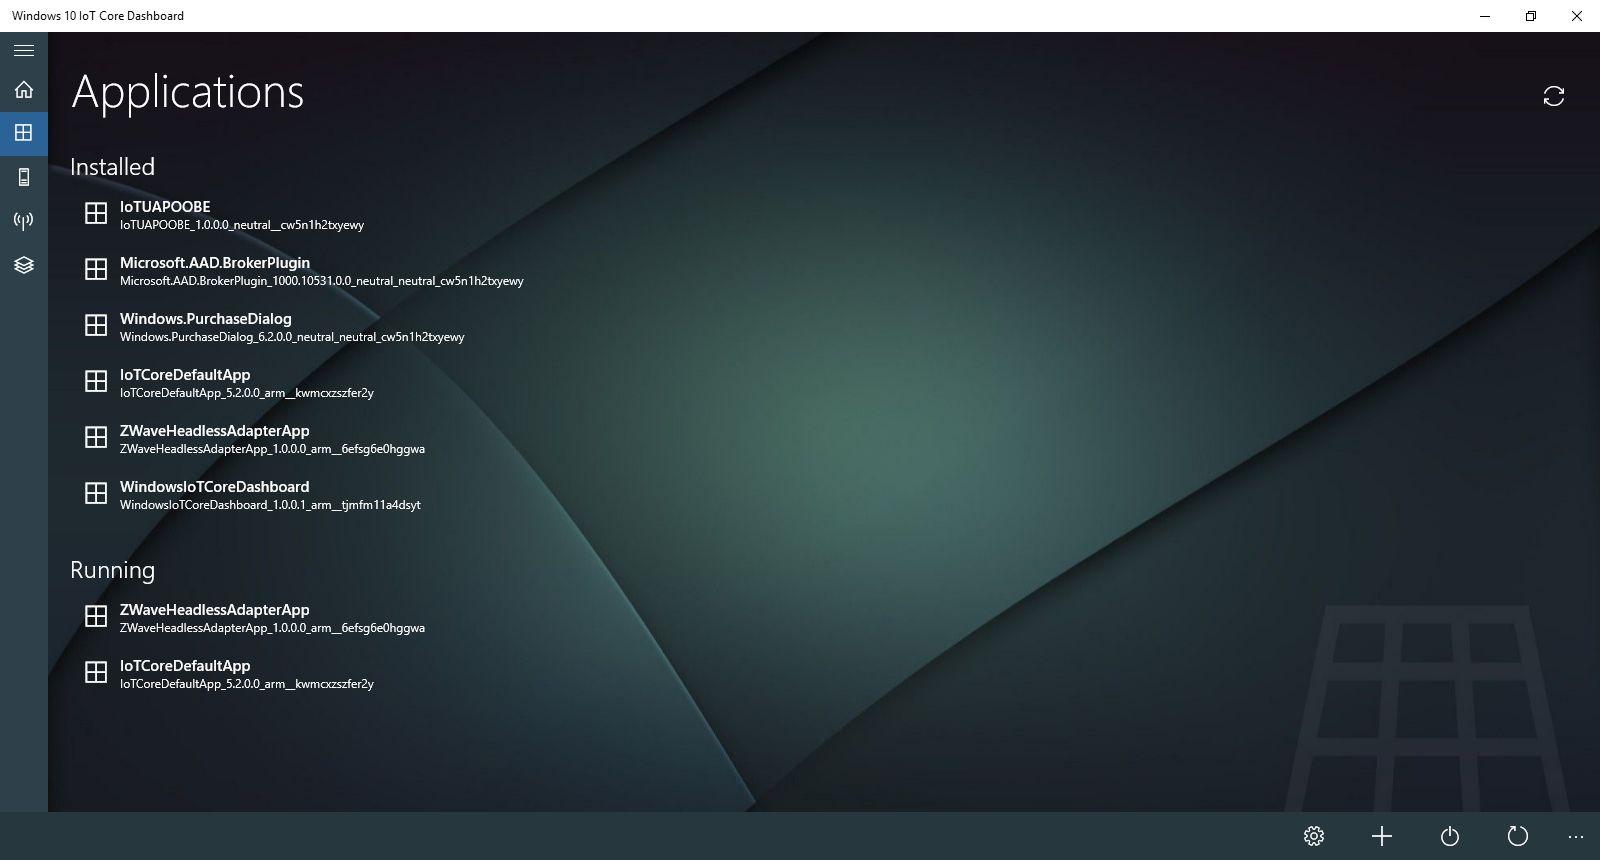 GitHub - hyprsoftcorp/WindowsIoTCoreDashboard: The Windows